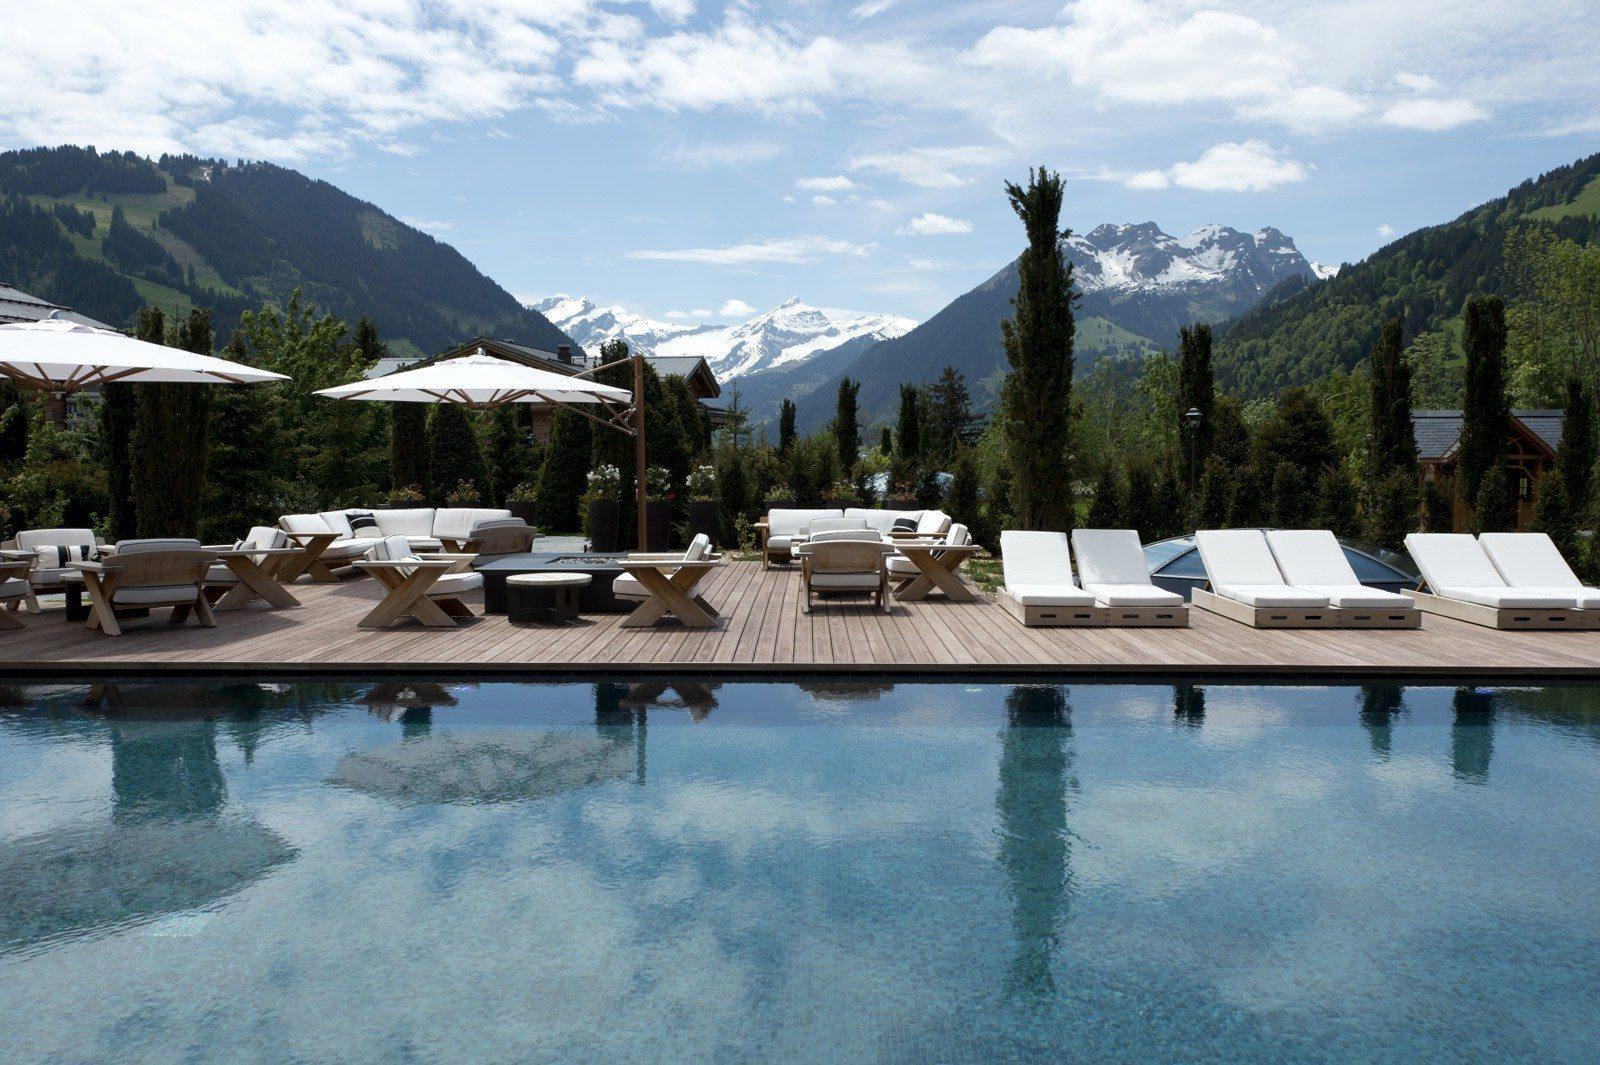 spa-six-senses-yoga-piscine-relaxation-bien-etre-1